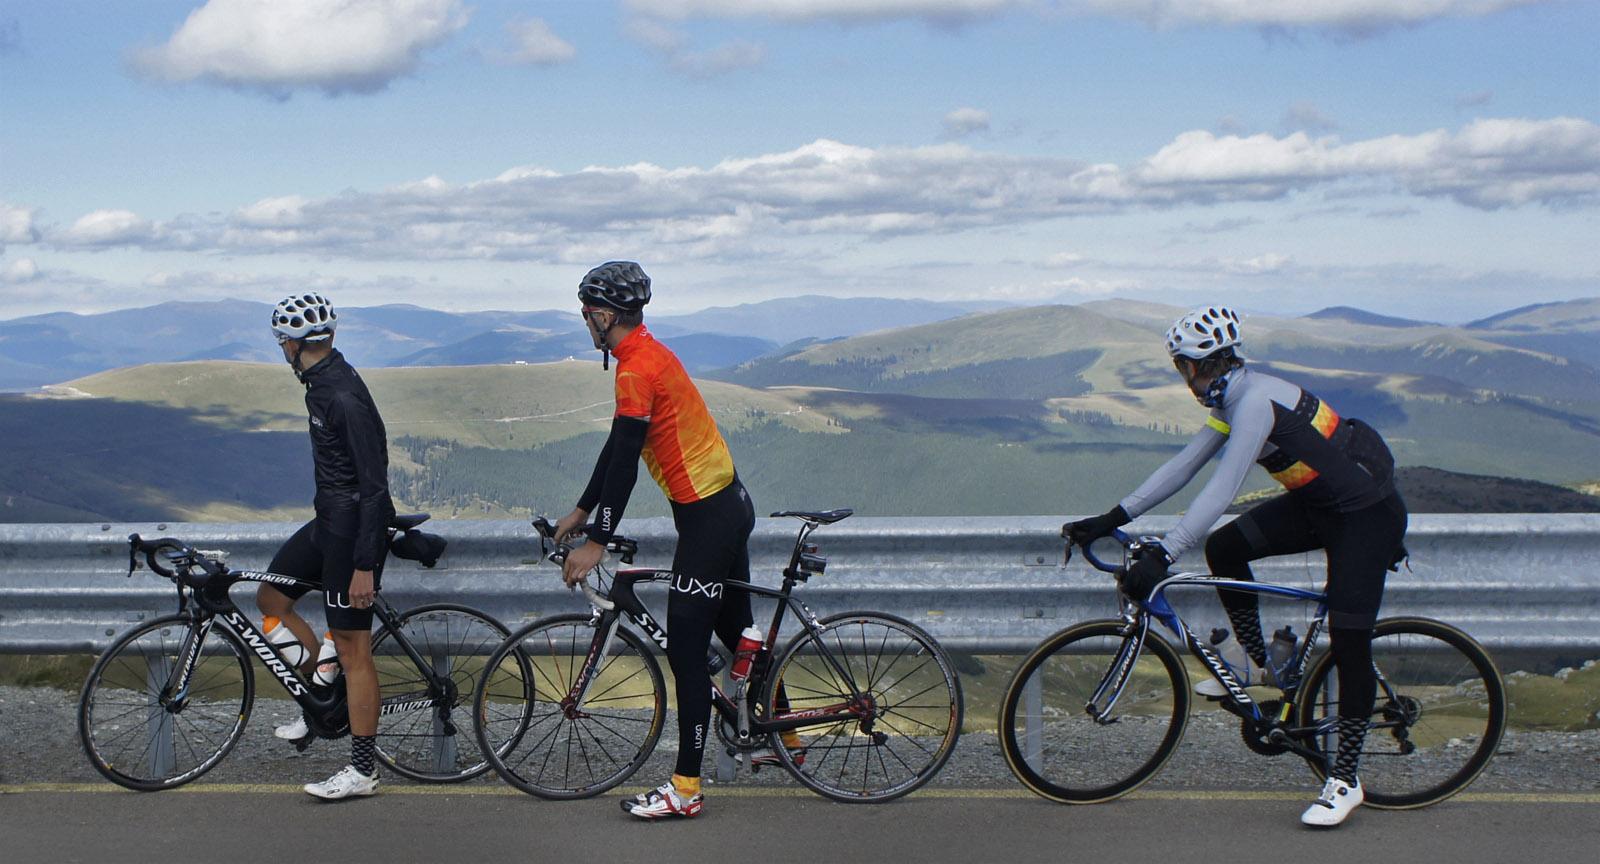 luxa romania rumunia cycling rower trip